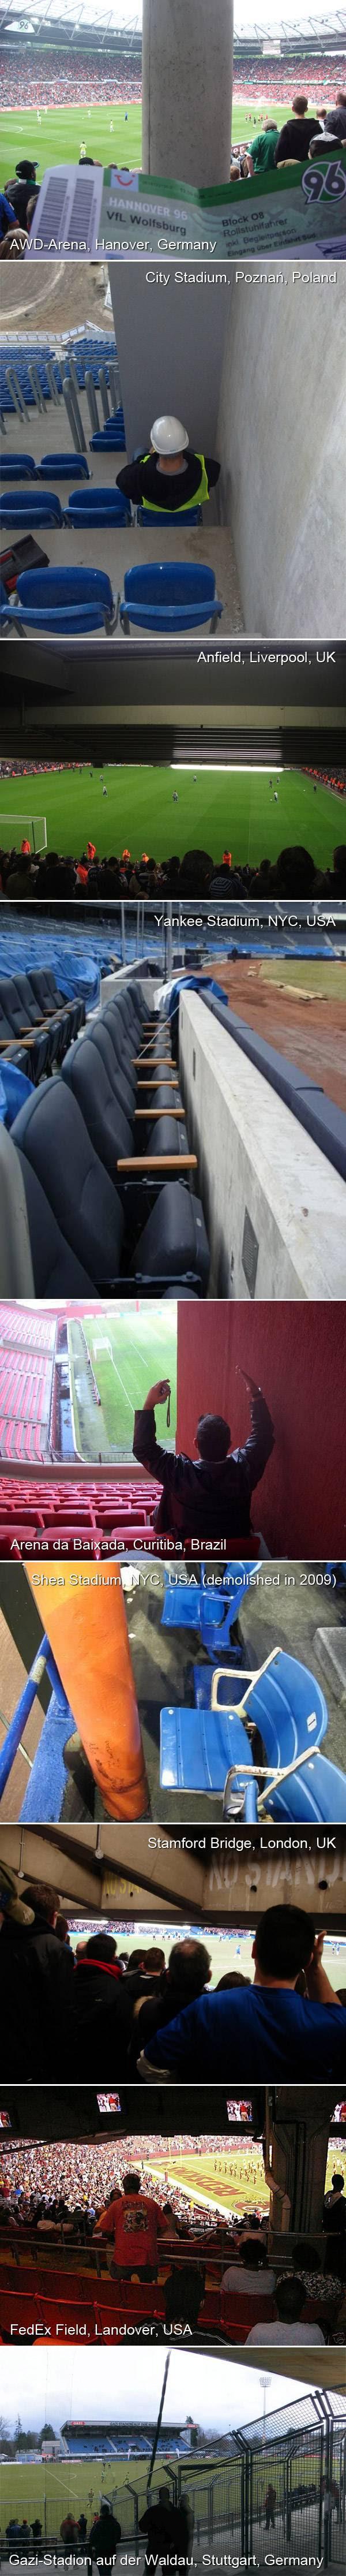 Stadium seating fails around the world